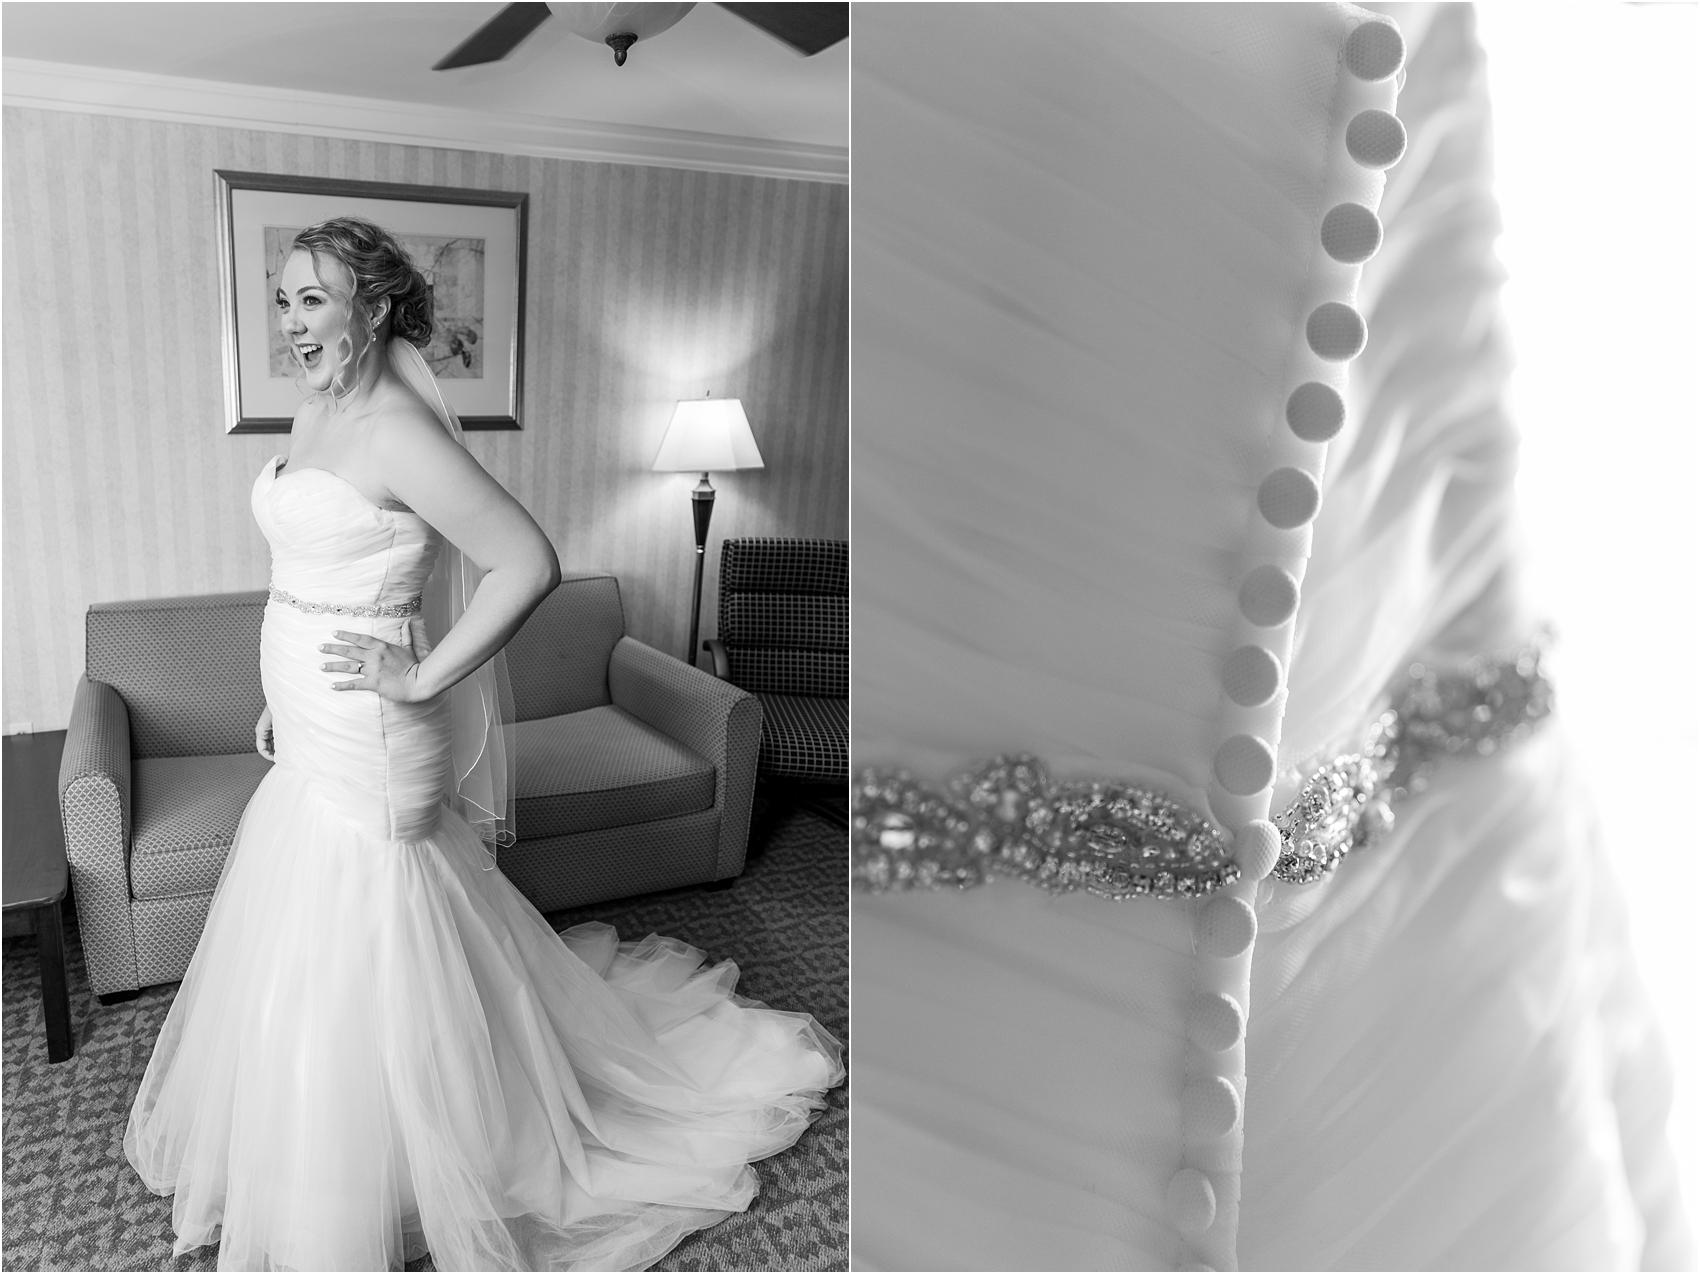 joyful-and-candid-navy-blush-wedding-photos-at-crystal-gardens-in-howell-mi-by-courtney-carolyn-photography_0027.jpg